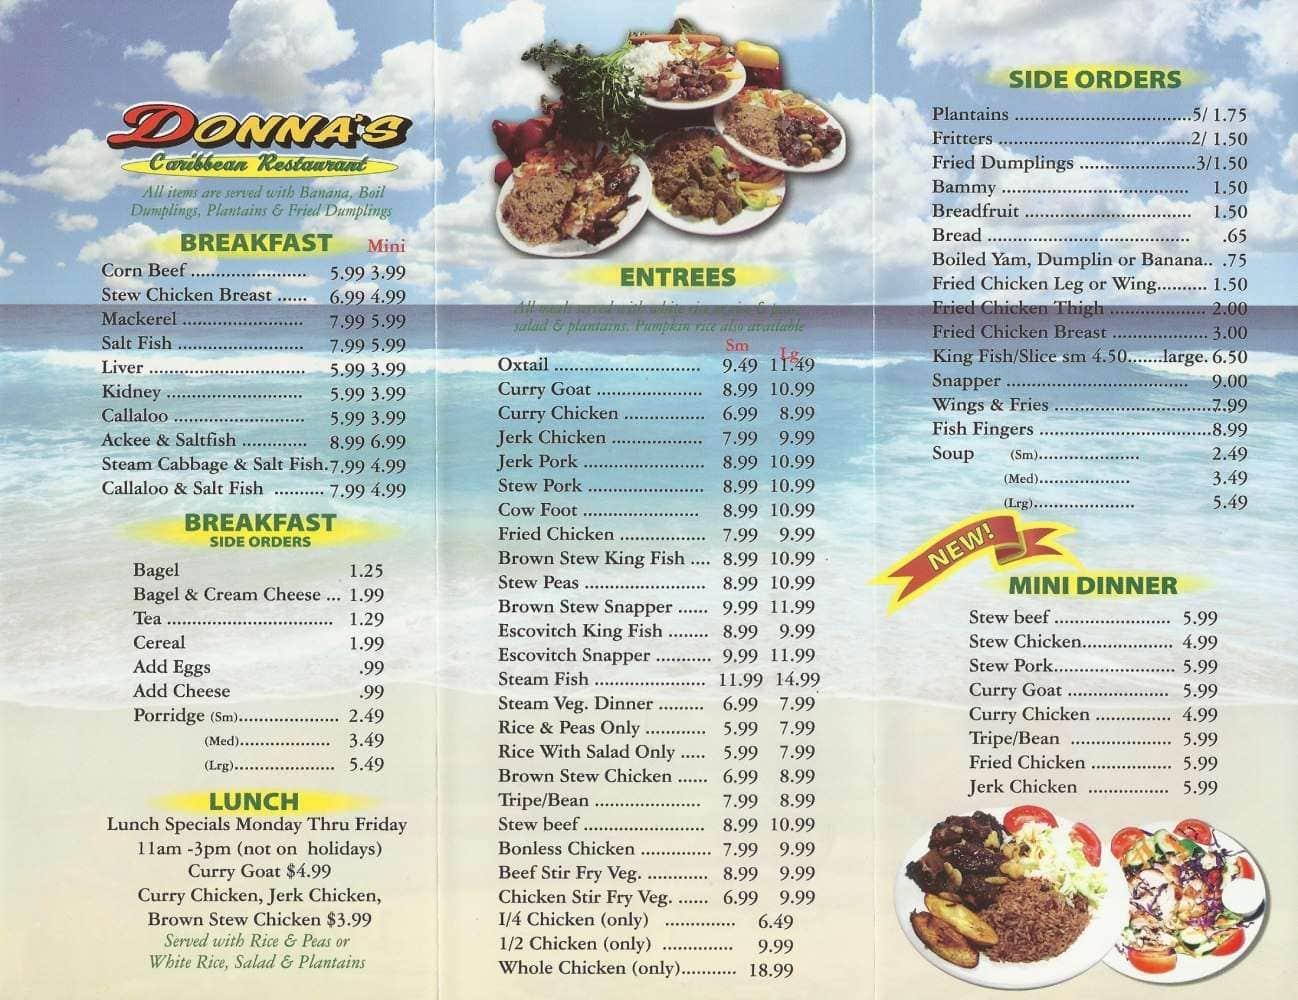 Caribbean Catering: Donna's Caribbean Restaurant Menu